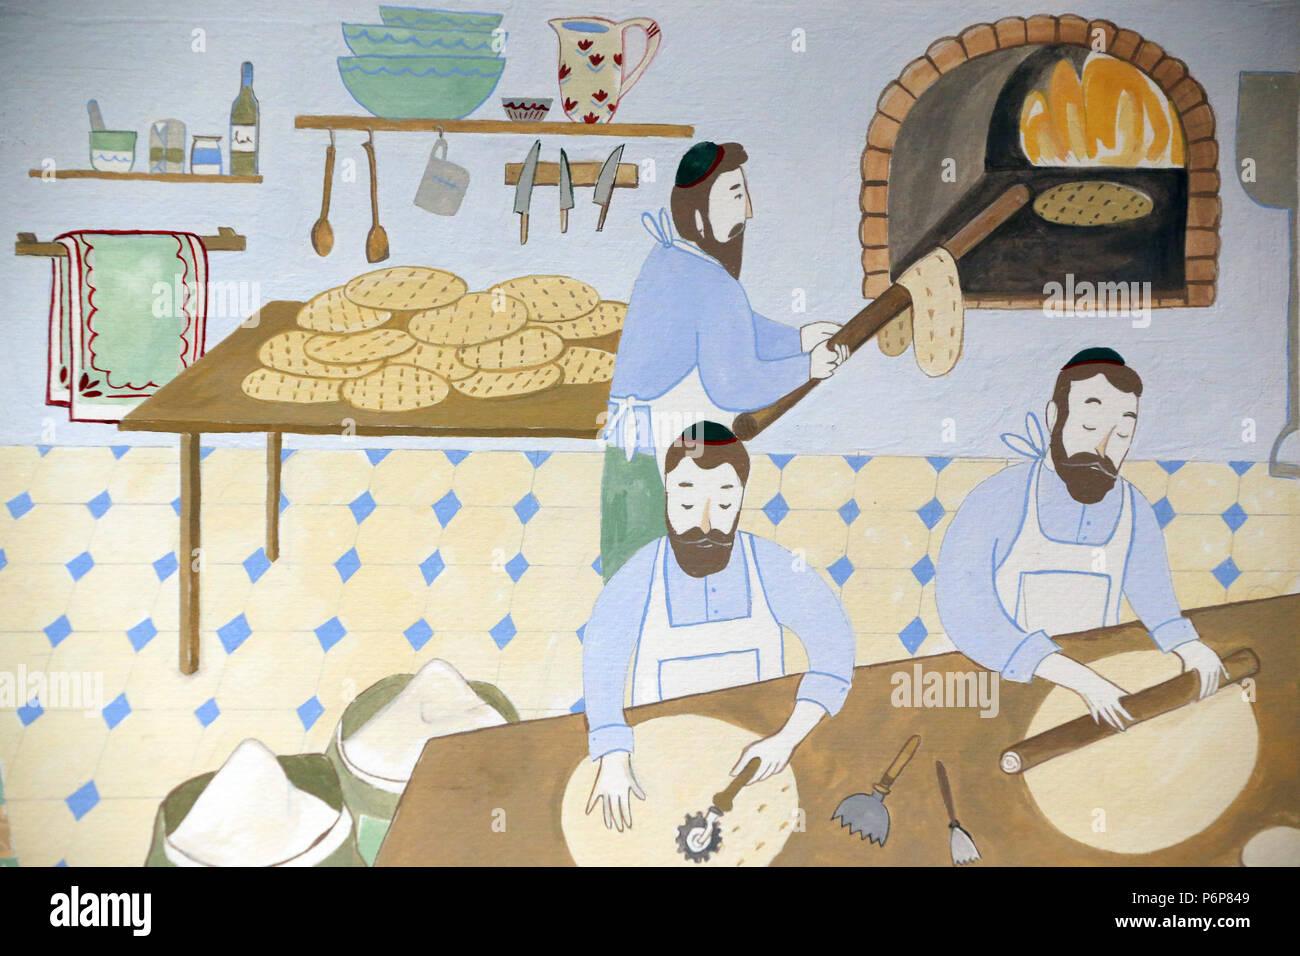 Jewish Museum of Switzerland. Basel. Passover. Matzo, the bread of affliction. - Stock Image